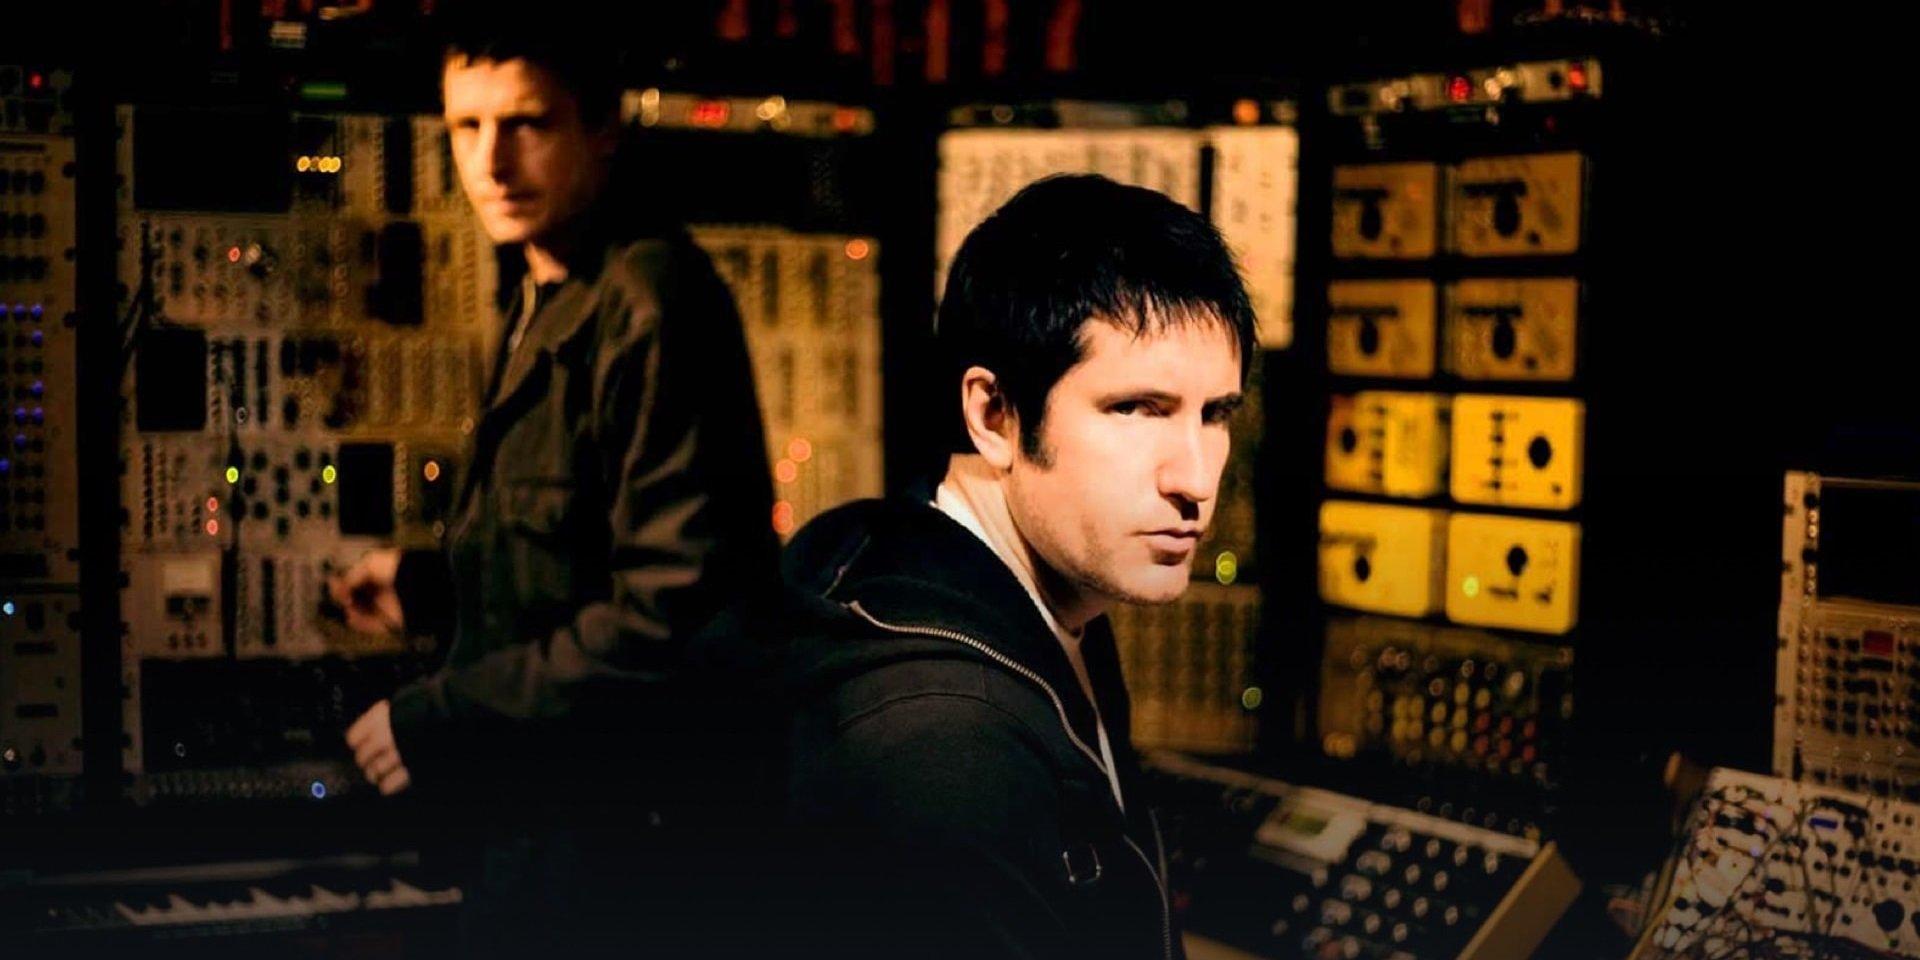 Trent Reznor and Atticus Ross to score new David Fincher film 'Mank'